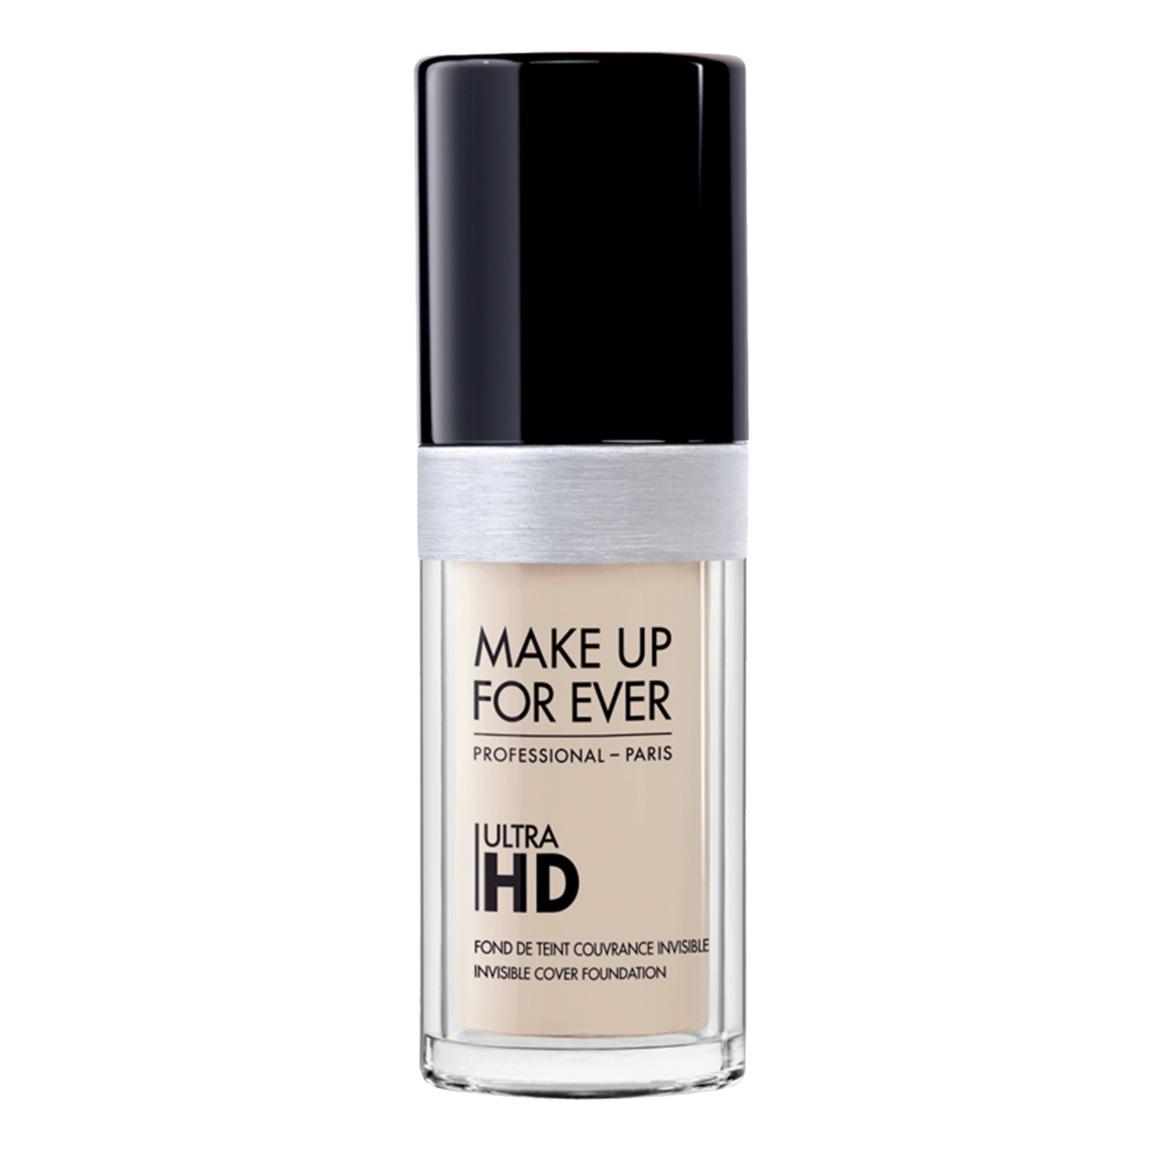 MAKE UP FOR EVER Ultra HD Foundation Y205 Alabaster   Beautylish